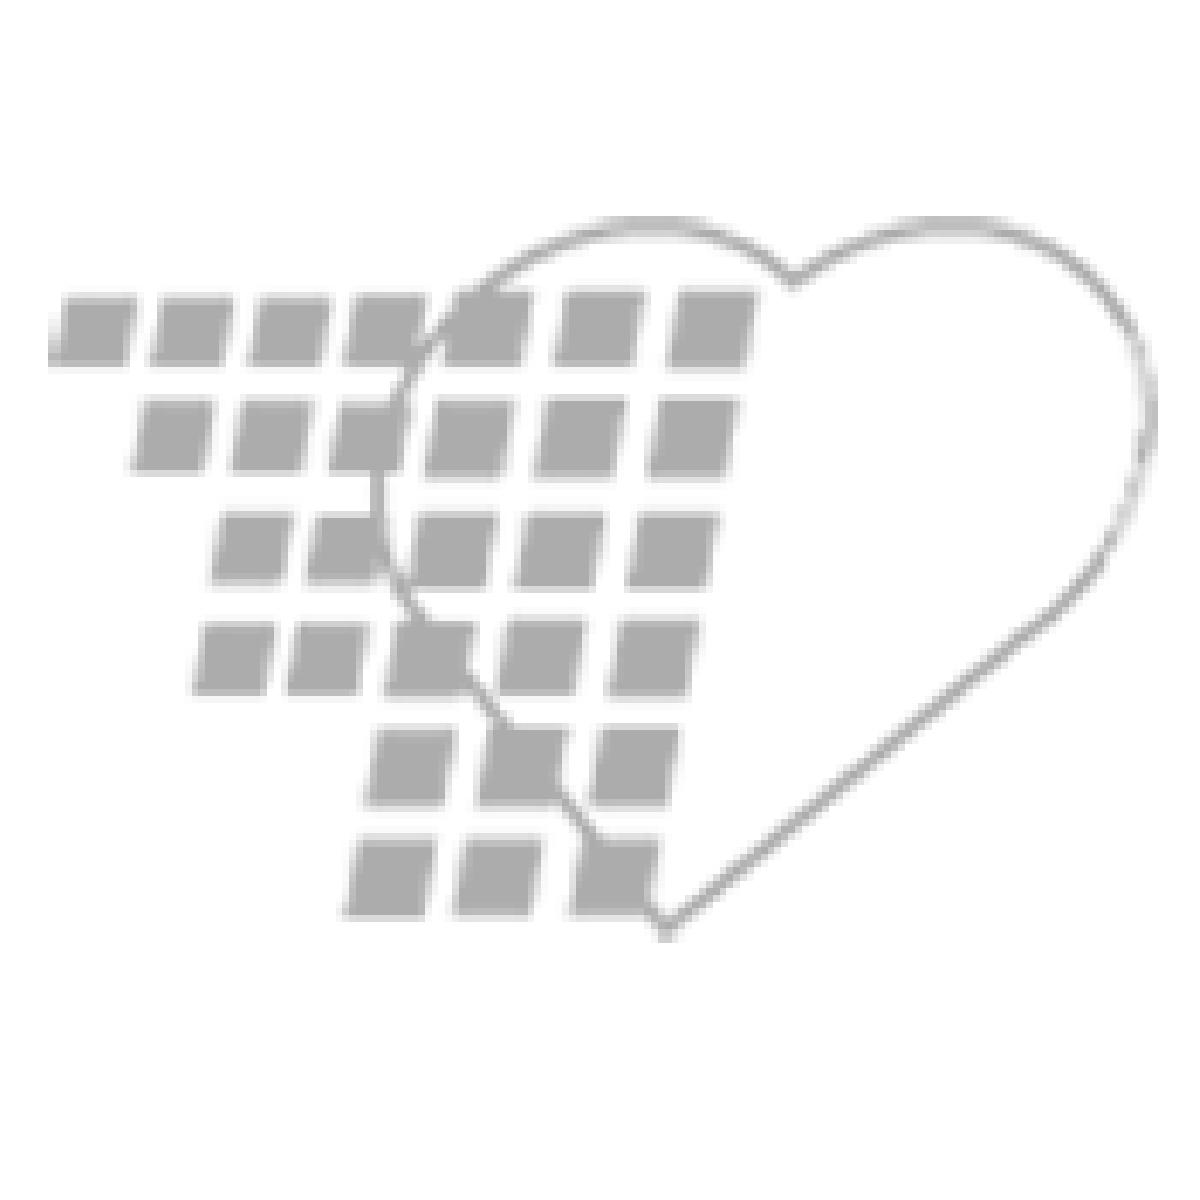 02-20-3400 Welch Allyn Connex ProBP 3400 Digital Blood Pressure Device